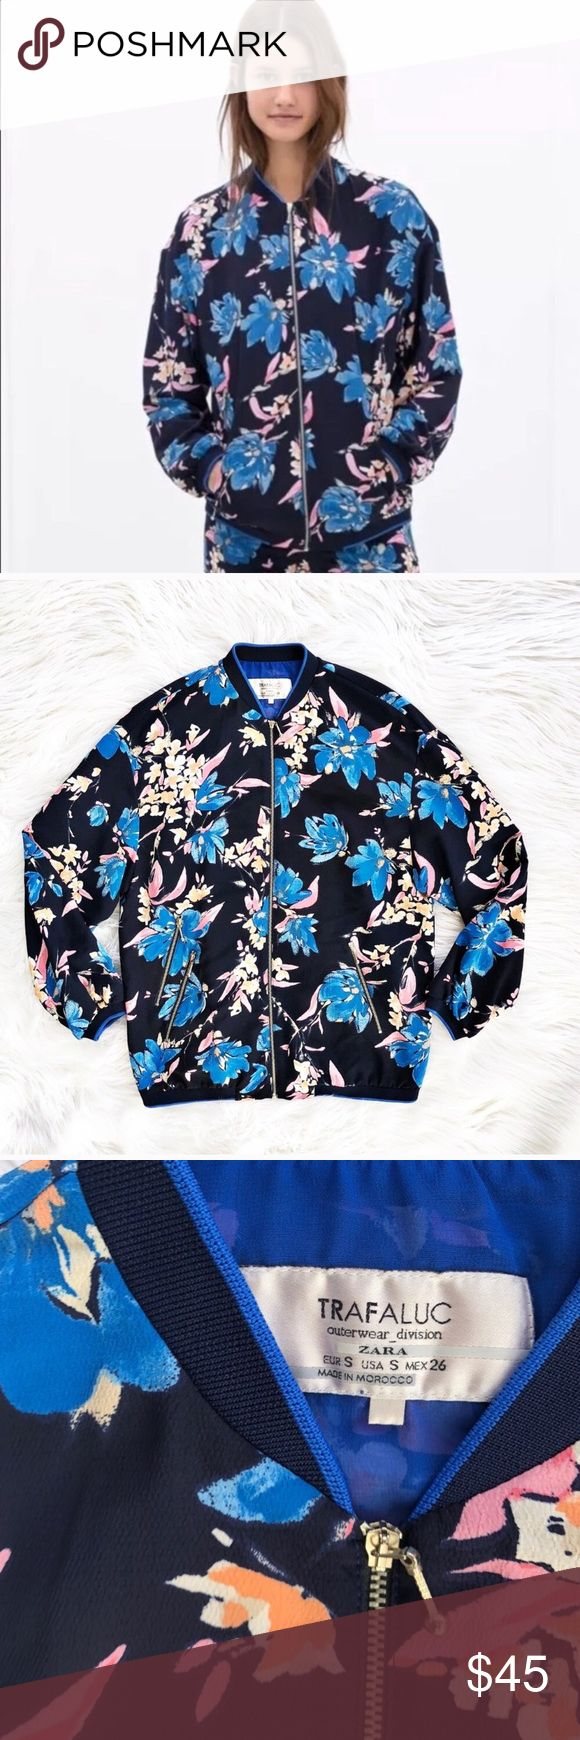 NWOT Zara flora bomber jacket vibrant floral